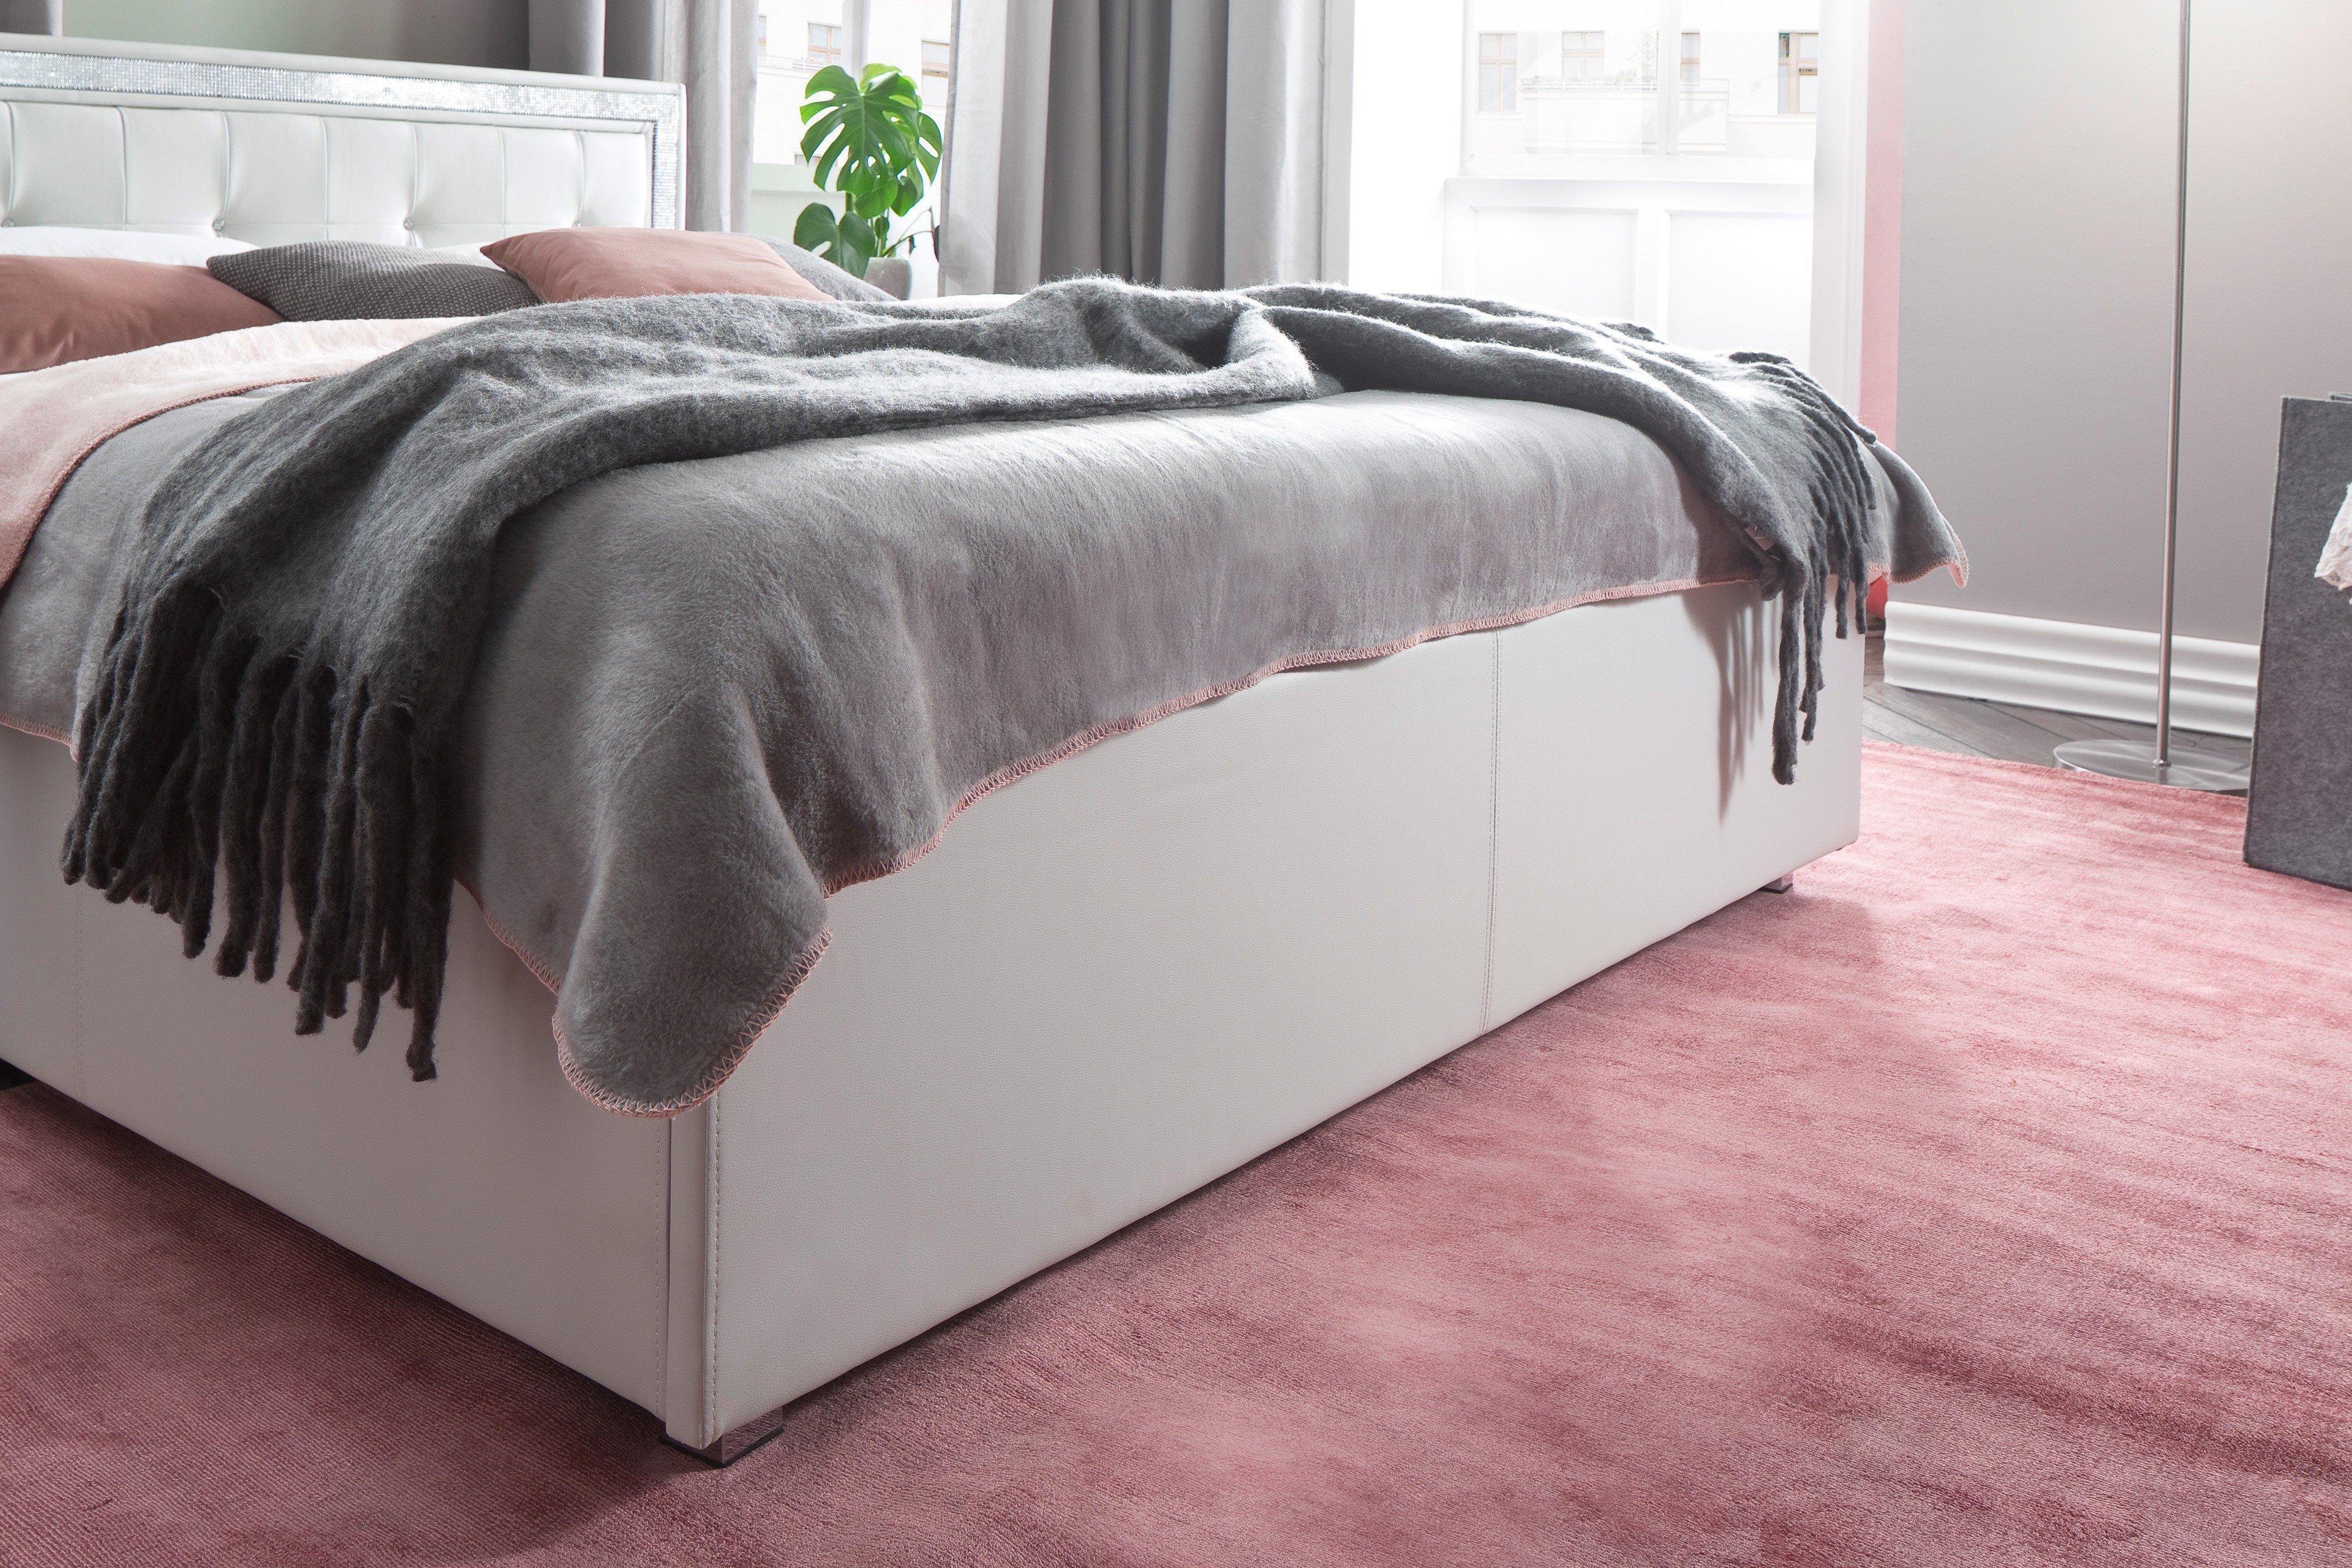 meise polsterbett mylife in kunstleder wei mit. Black Bedroom Furniture Sets. Home Design Ideas